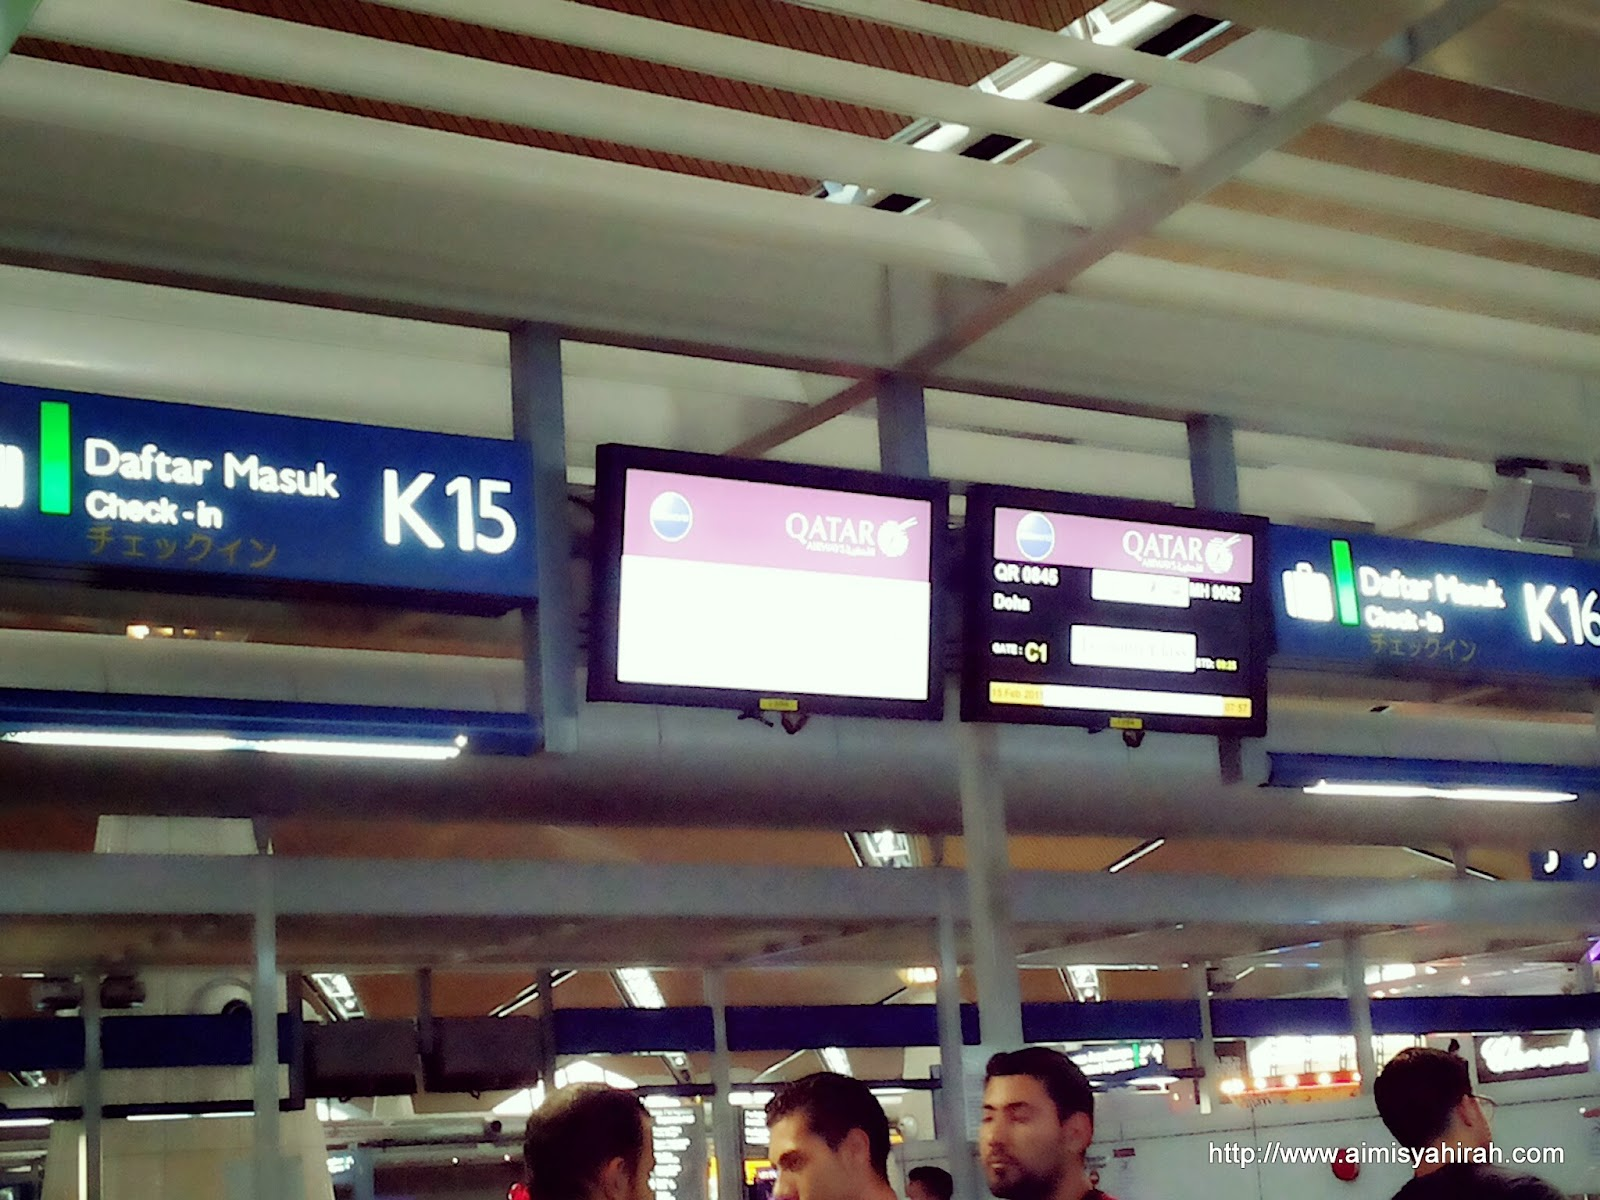 AIMI SYAHIRAH  MarvelousMisya: Istanbul Trip #1 : 3 flight